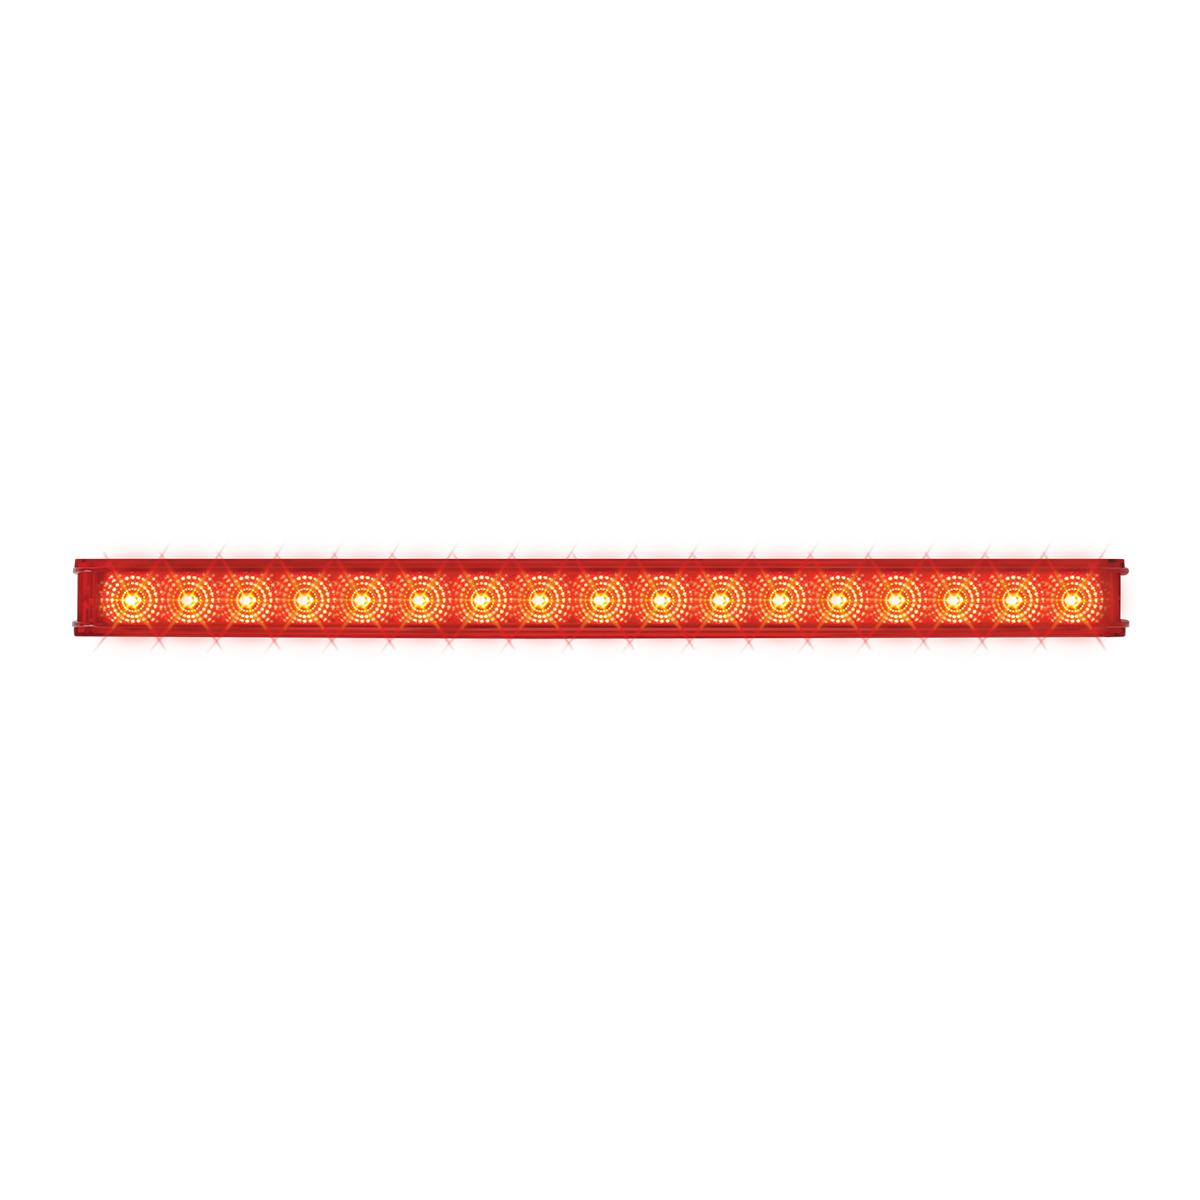 "76982 20"" Spyder LED Light Bar"